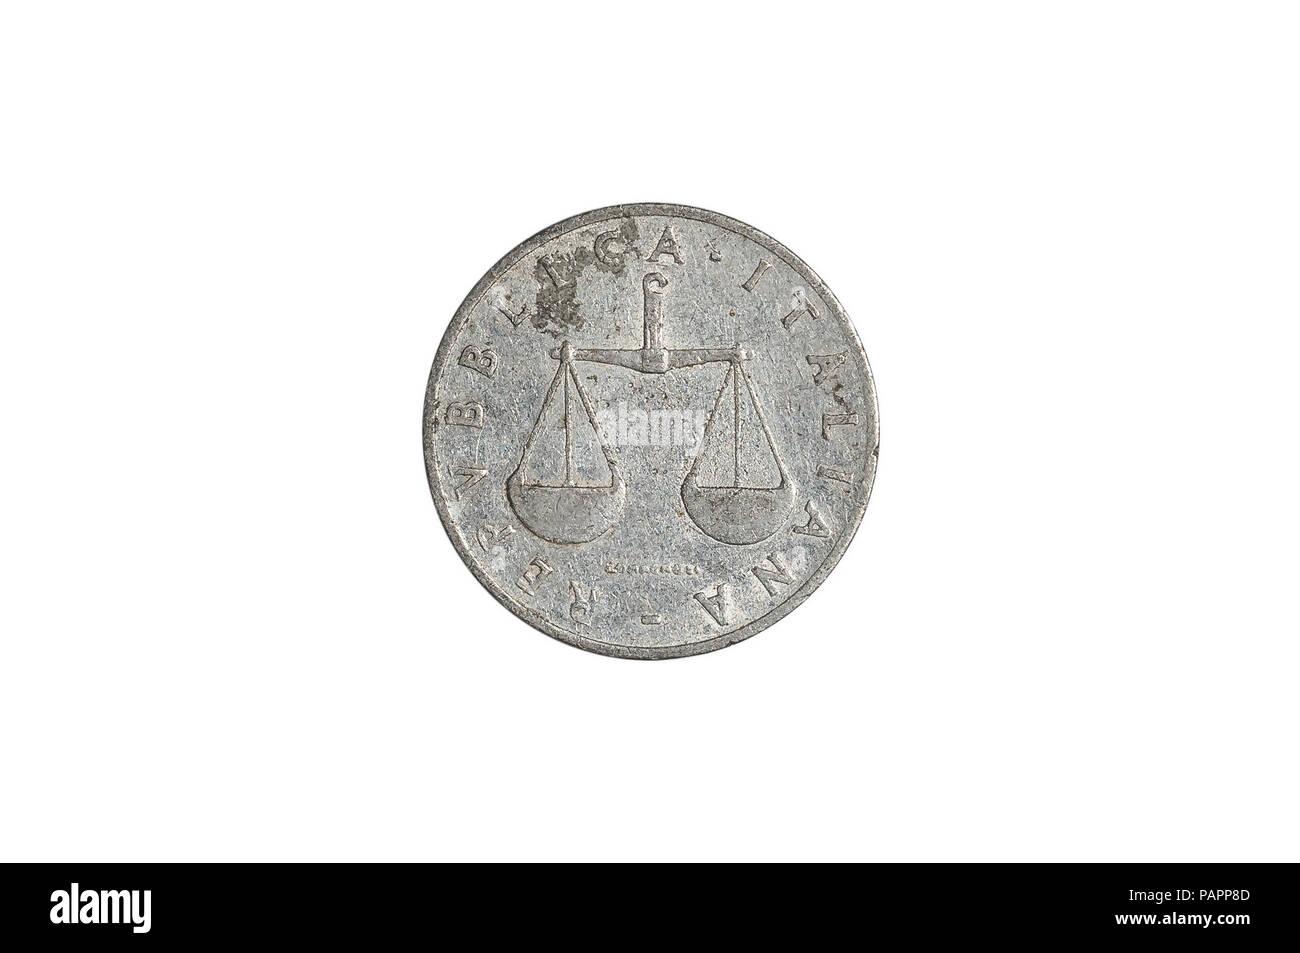 Italian Lire Coin Stock Photos & Italian Lire Coin Stock